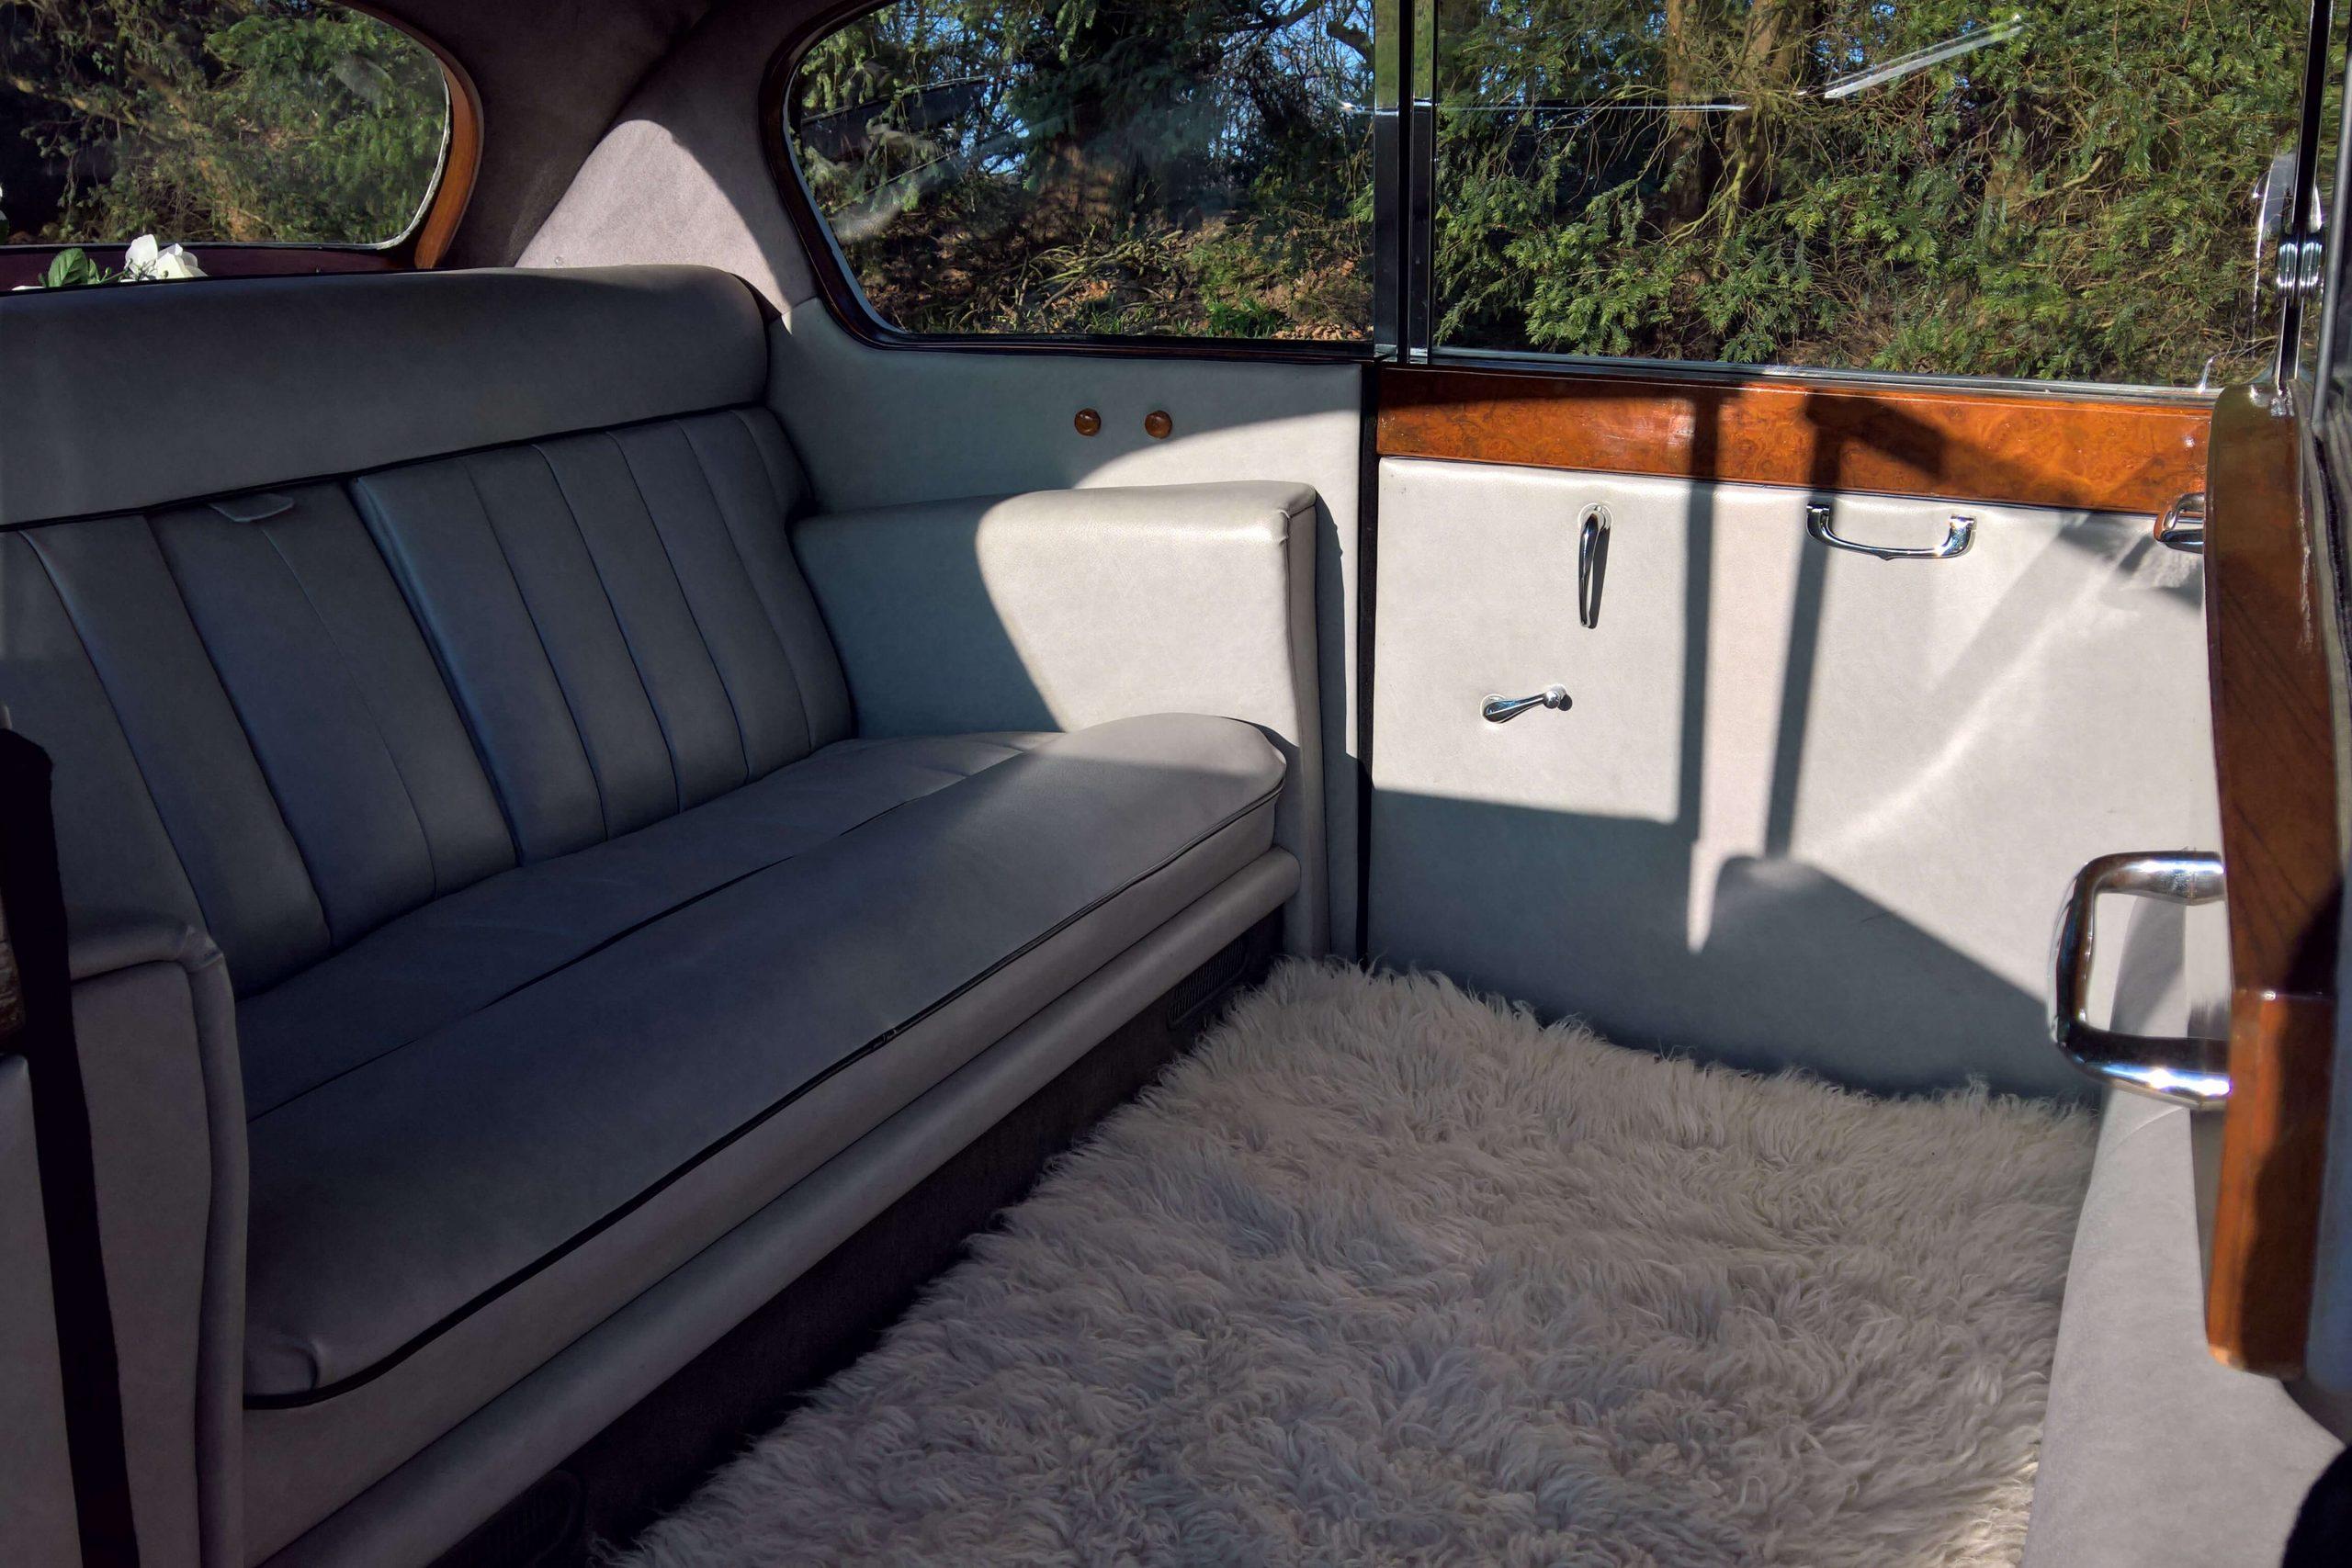 1960 Austin Princess Limousine – White